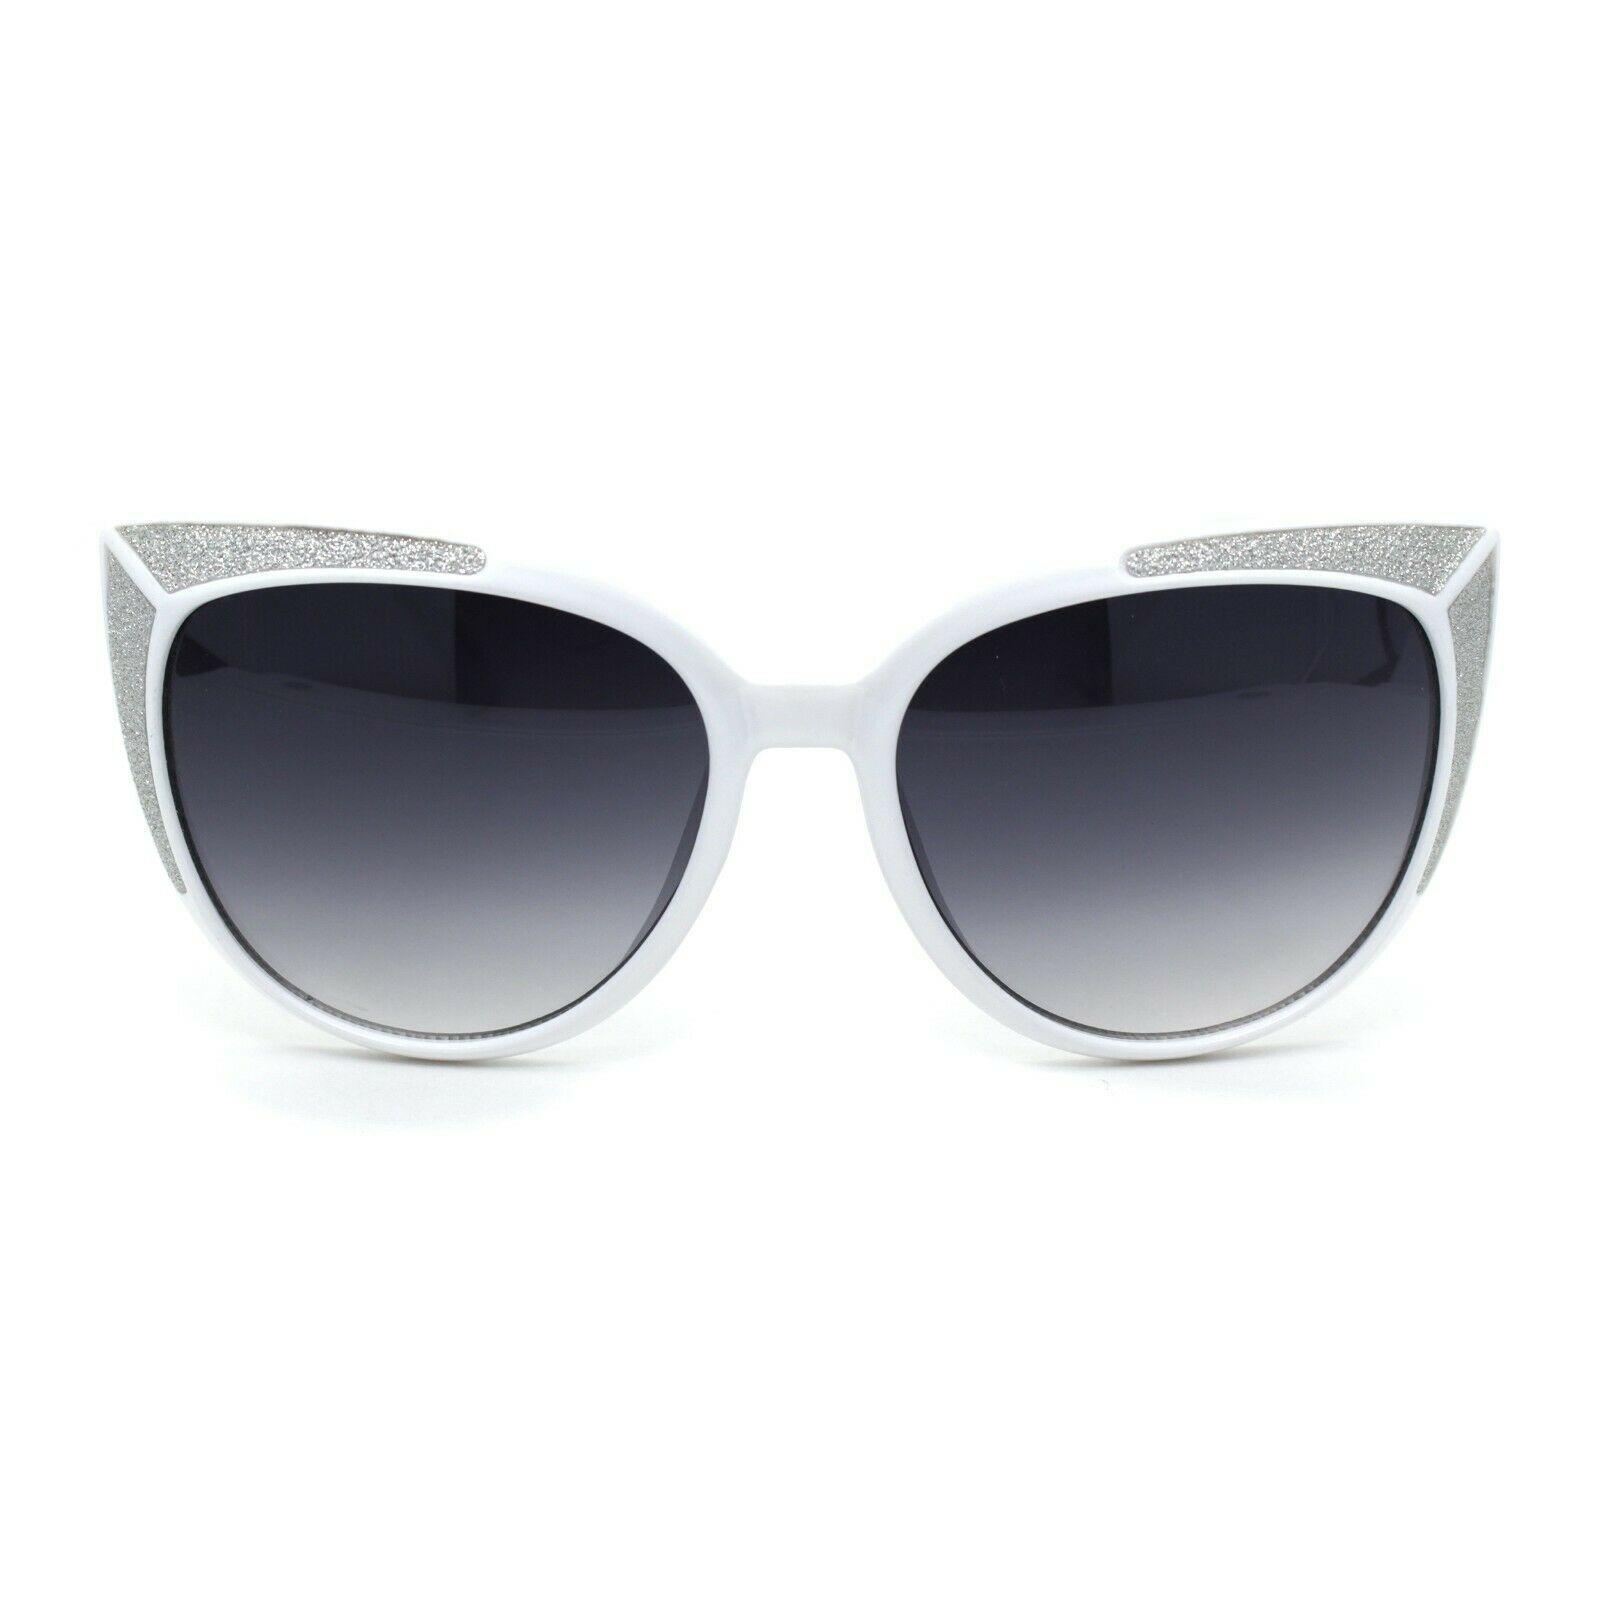 Womens Glitter Trim Oversize Cat Eye Mod Plastic Sunglasses